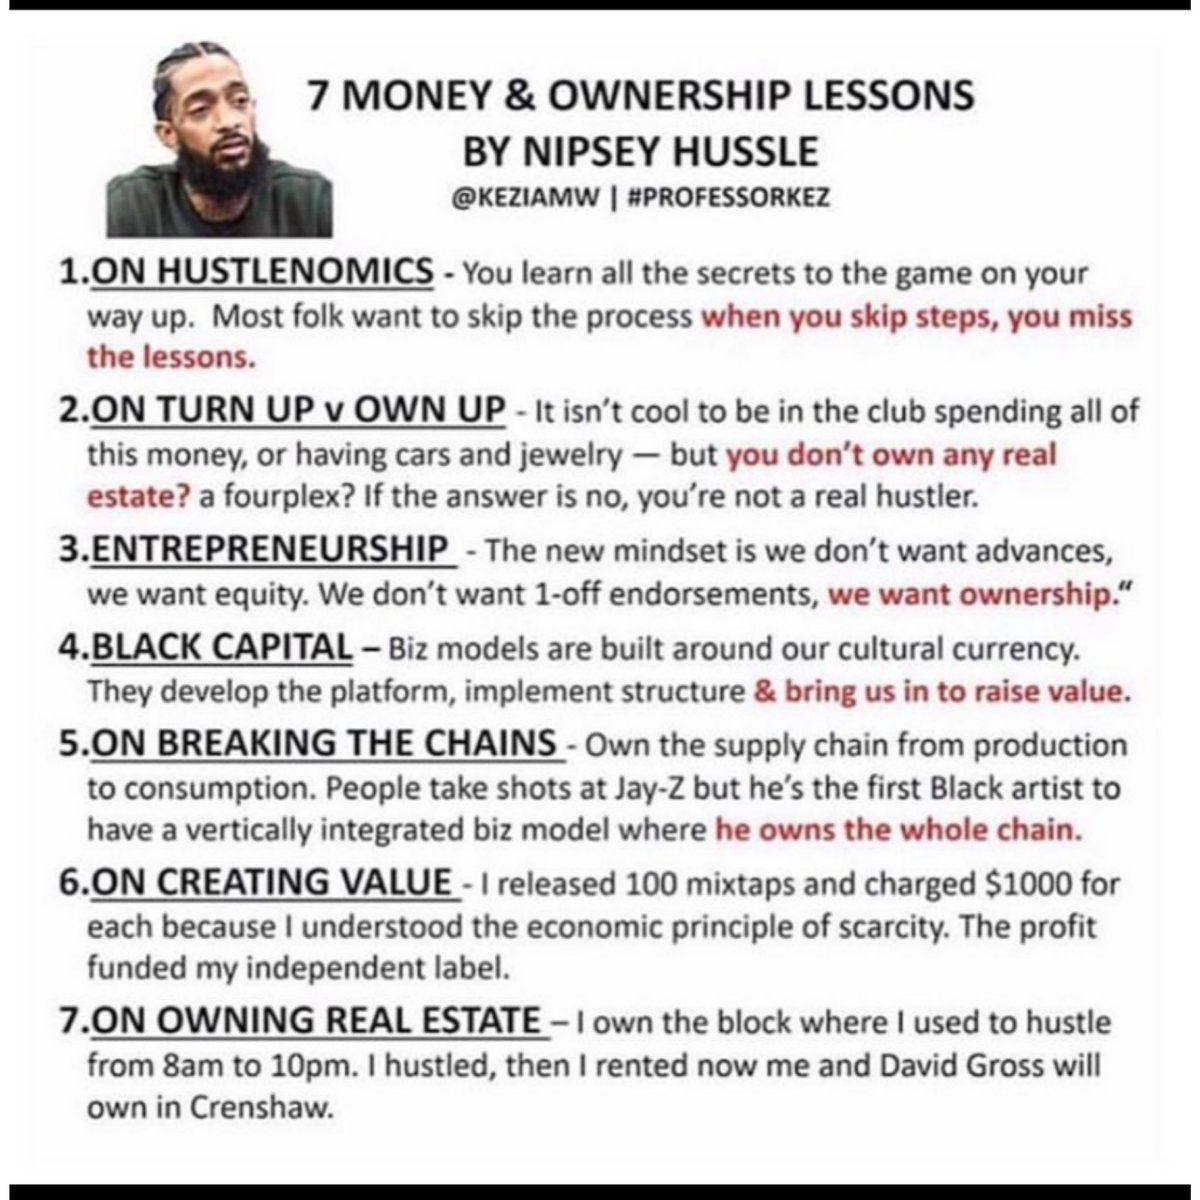 Nipsey was always dropping great financial advice RIP and happy bday nipsey #Finance #FinancialFreedom #Entrepreneur #NipseyHussle #NipseyBlue